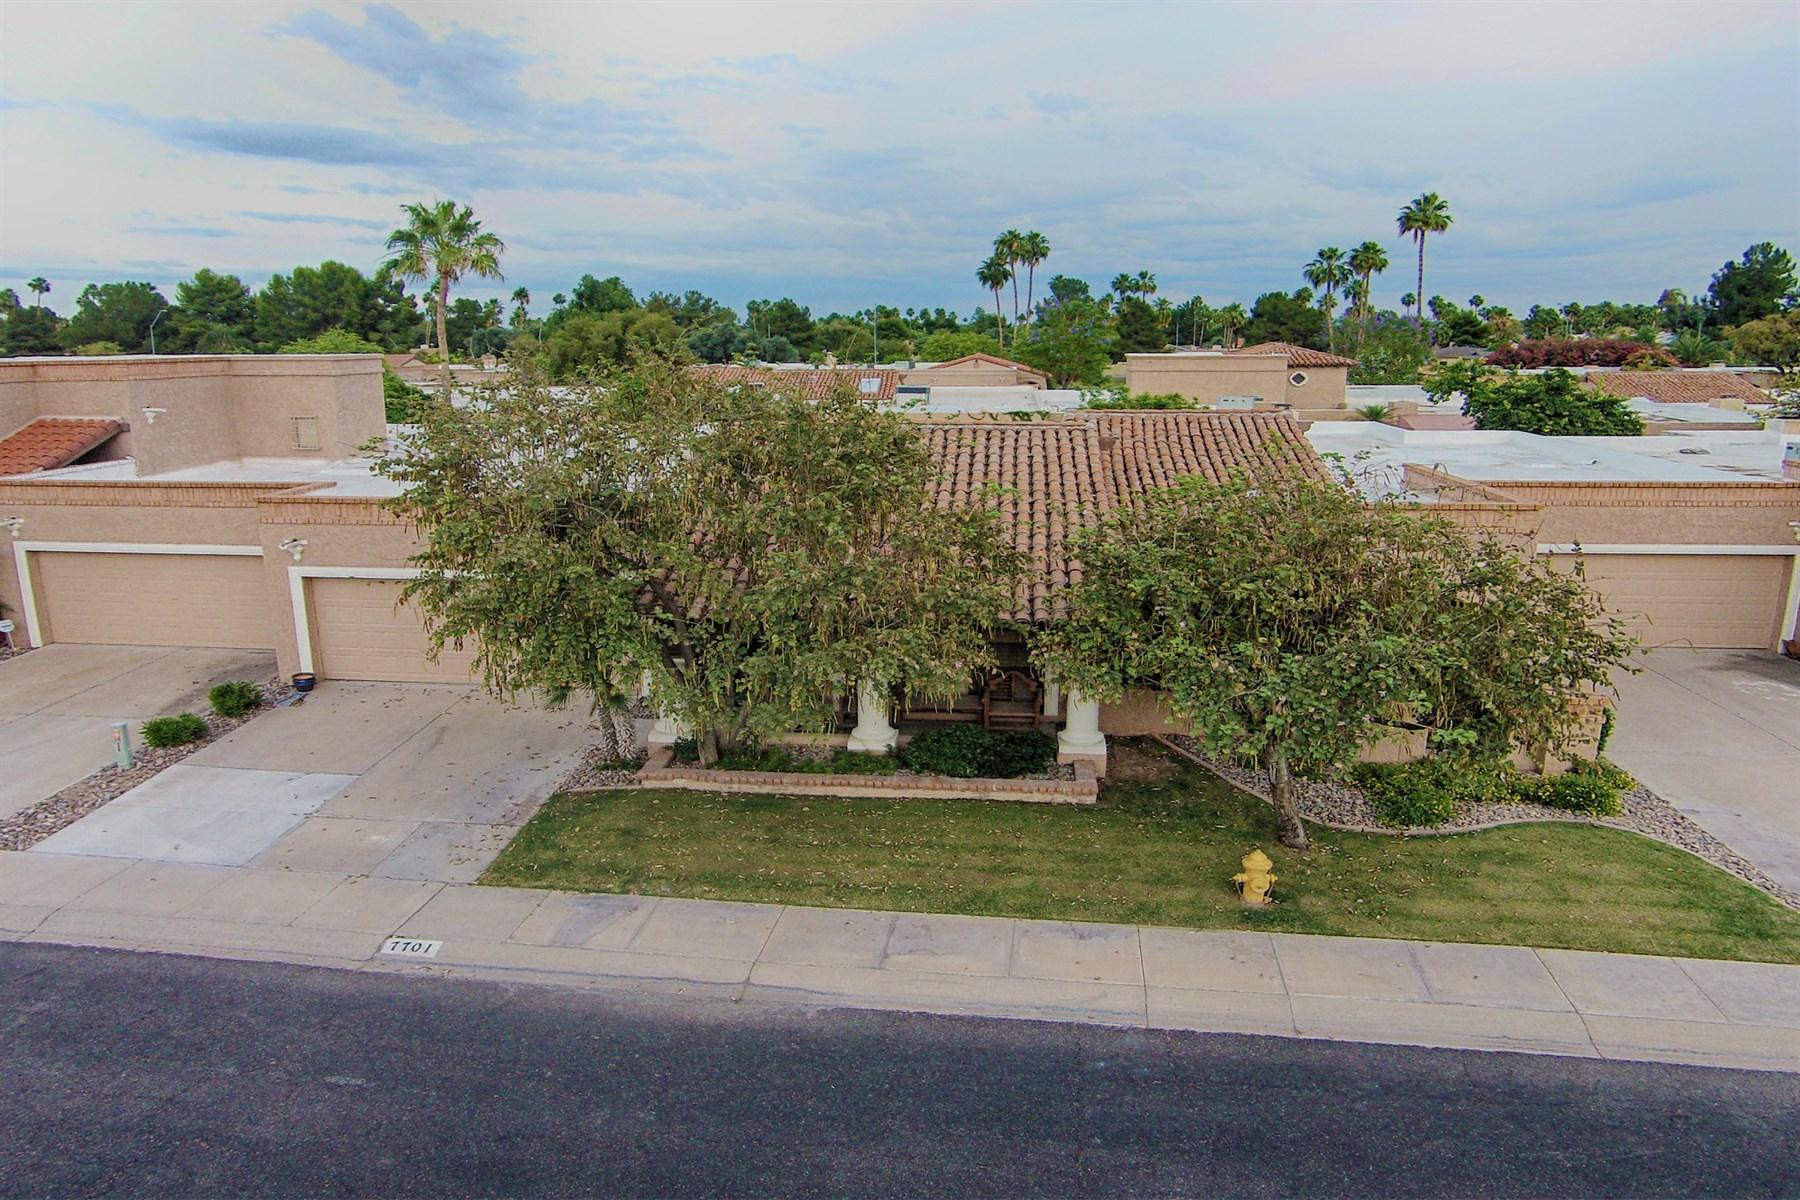 Nhà ở một gia đình vì Bán tại Beautifully Remodeled Single Level Patio Home in the Heart of Scottsdale 7701 N VIA CAMELLO DEL NORTE ST Scottsdale, Arizona 85258 Hoa Kỳ